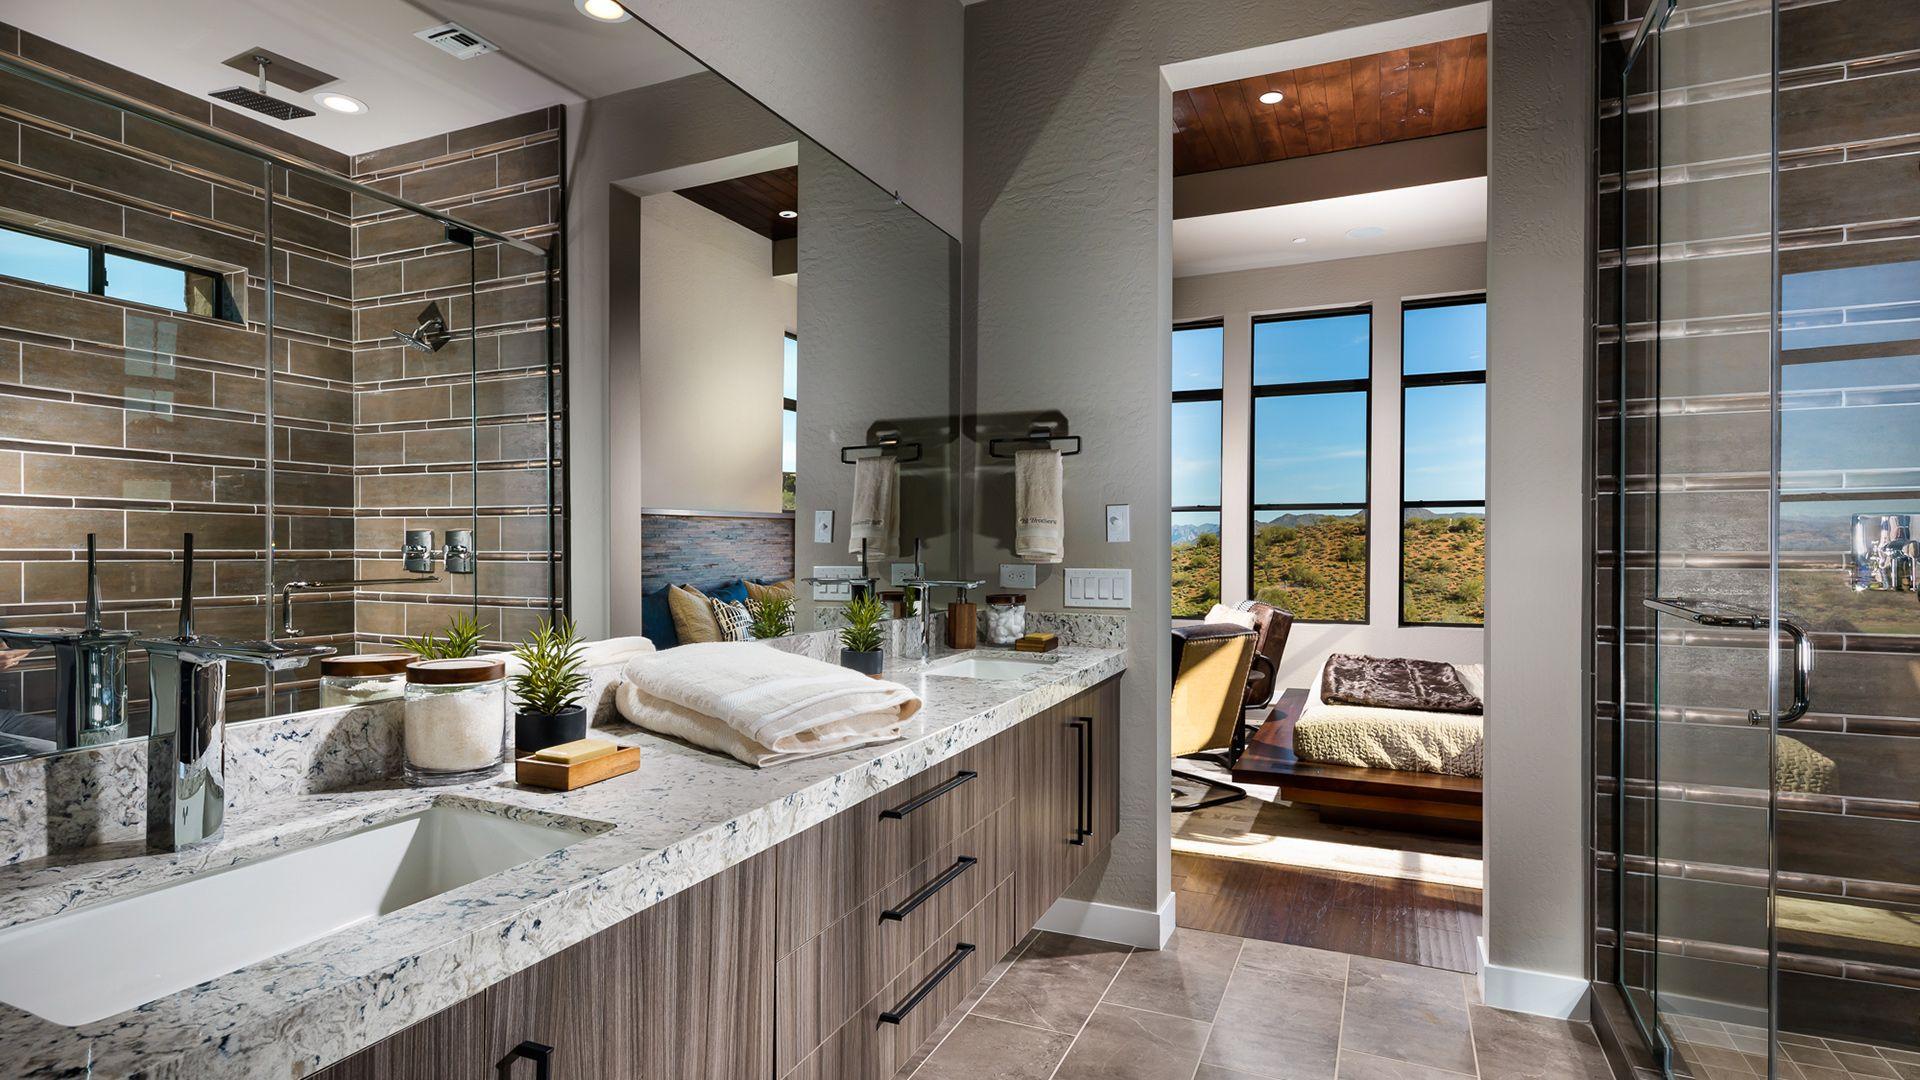 The Overlook At Firerock In 2020 Amazing Bathrooms Home